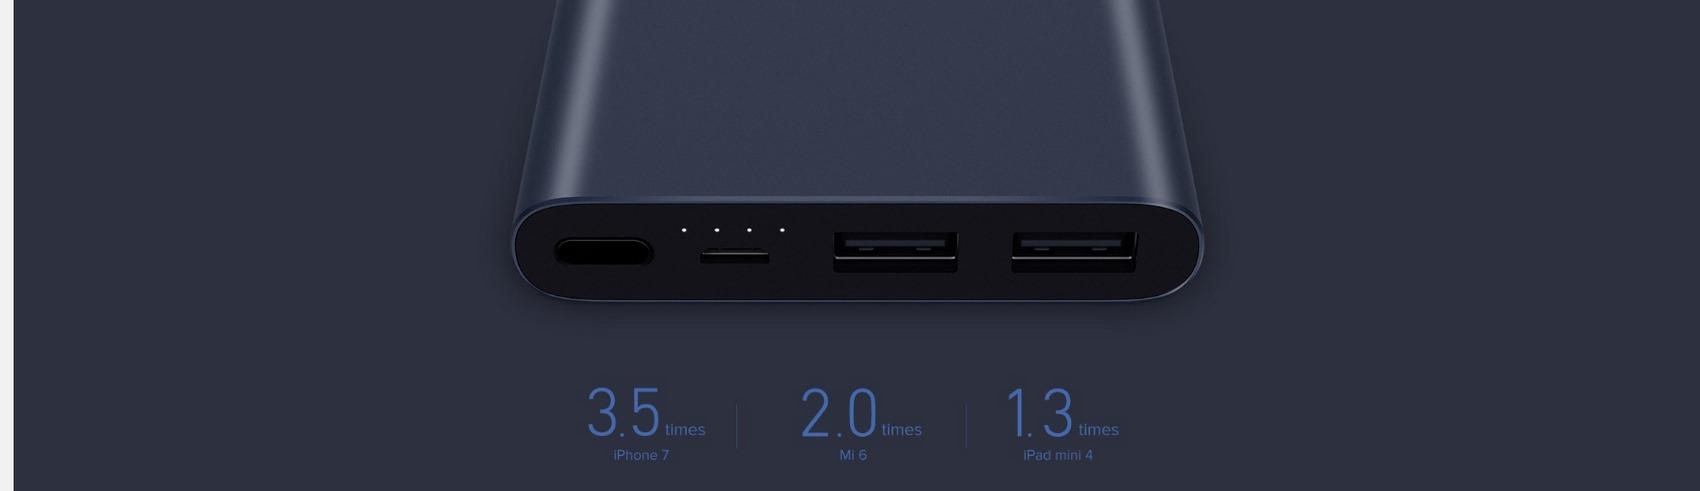 Xiaomi Mi 10000mAH Power Bank 2S Daul USB Quick Charge 3.0 Silver - Larger Capacity